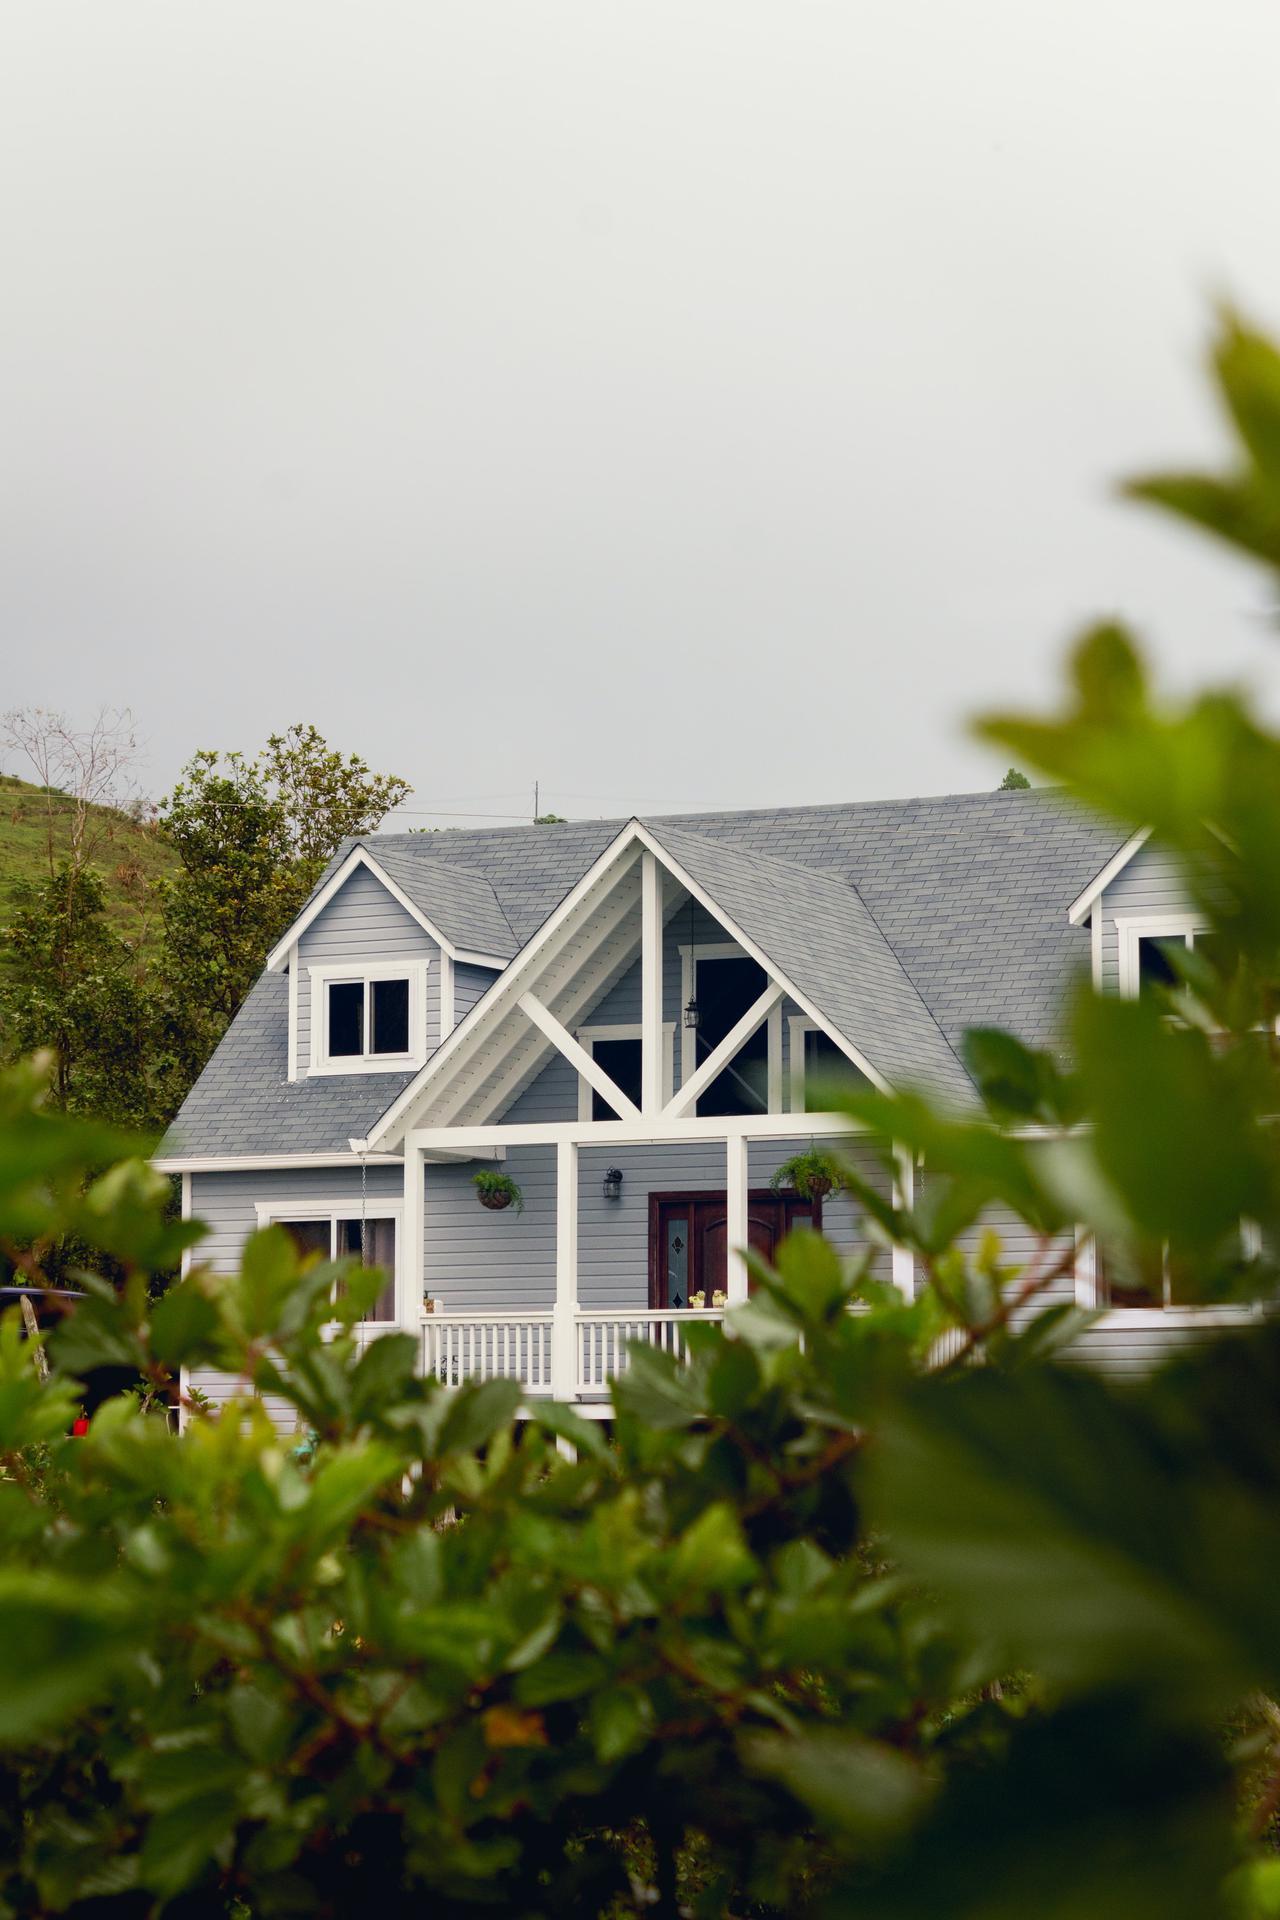 Grey house behind green bushes.